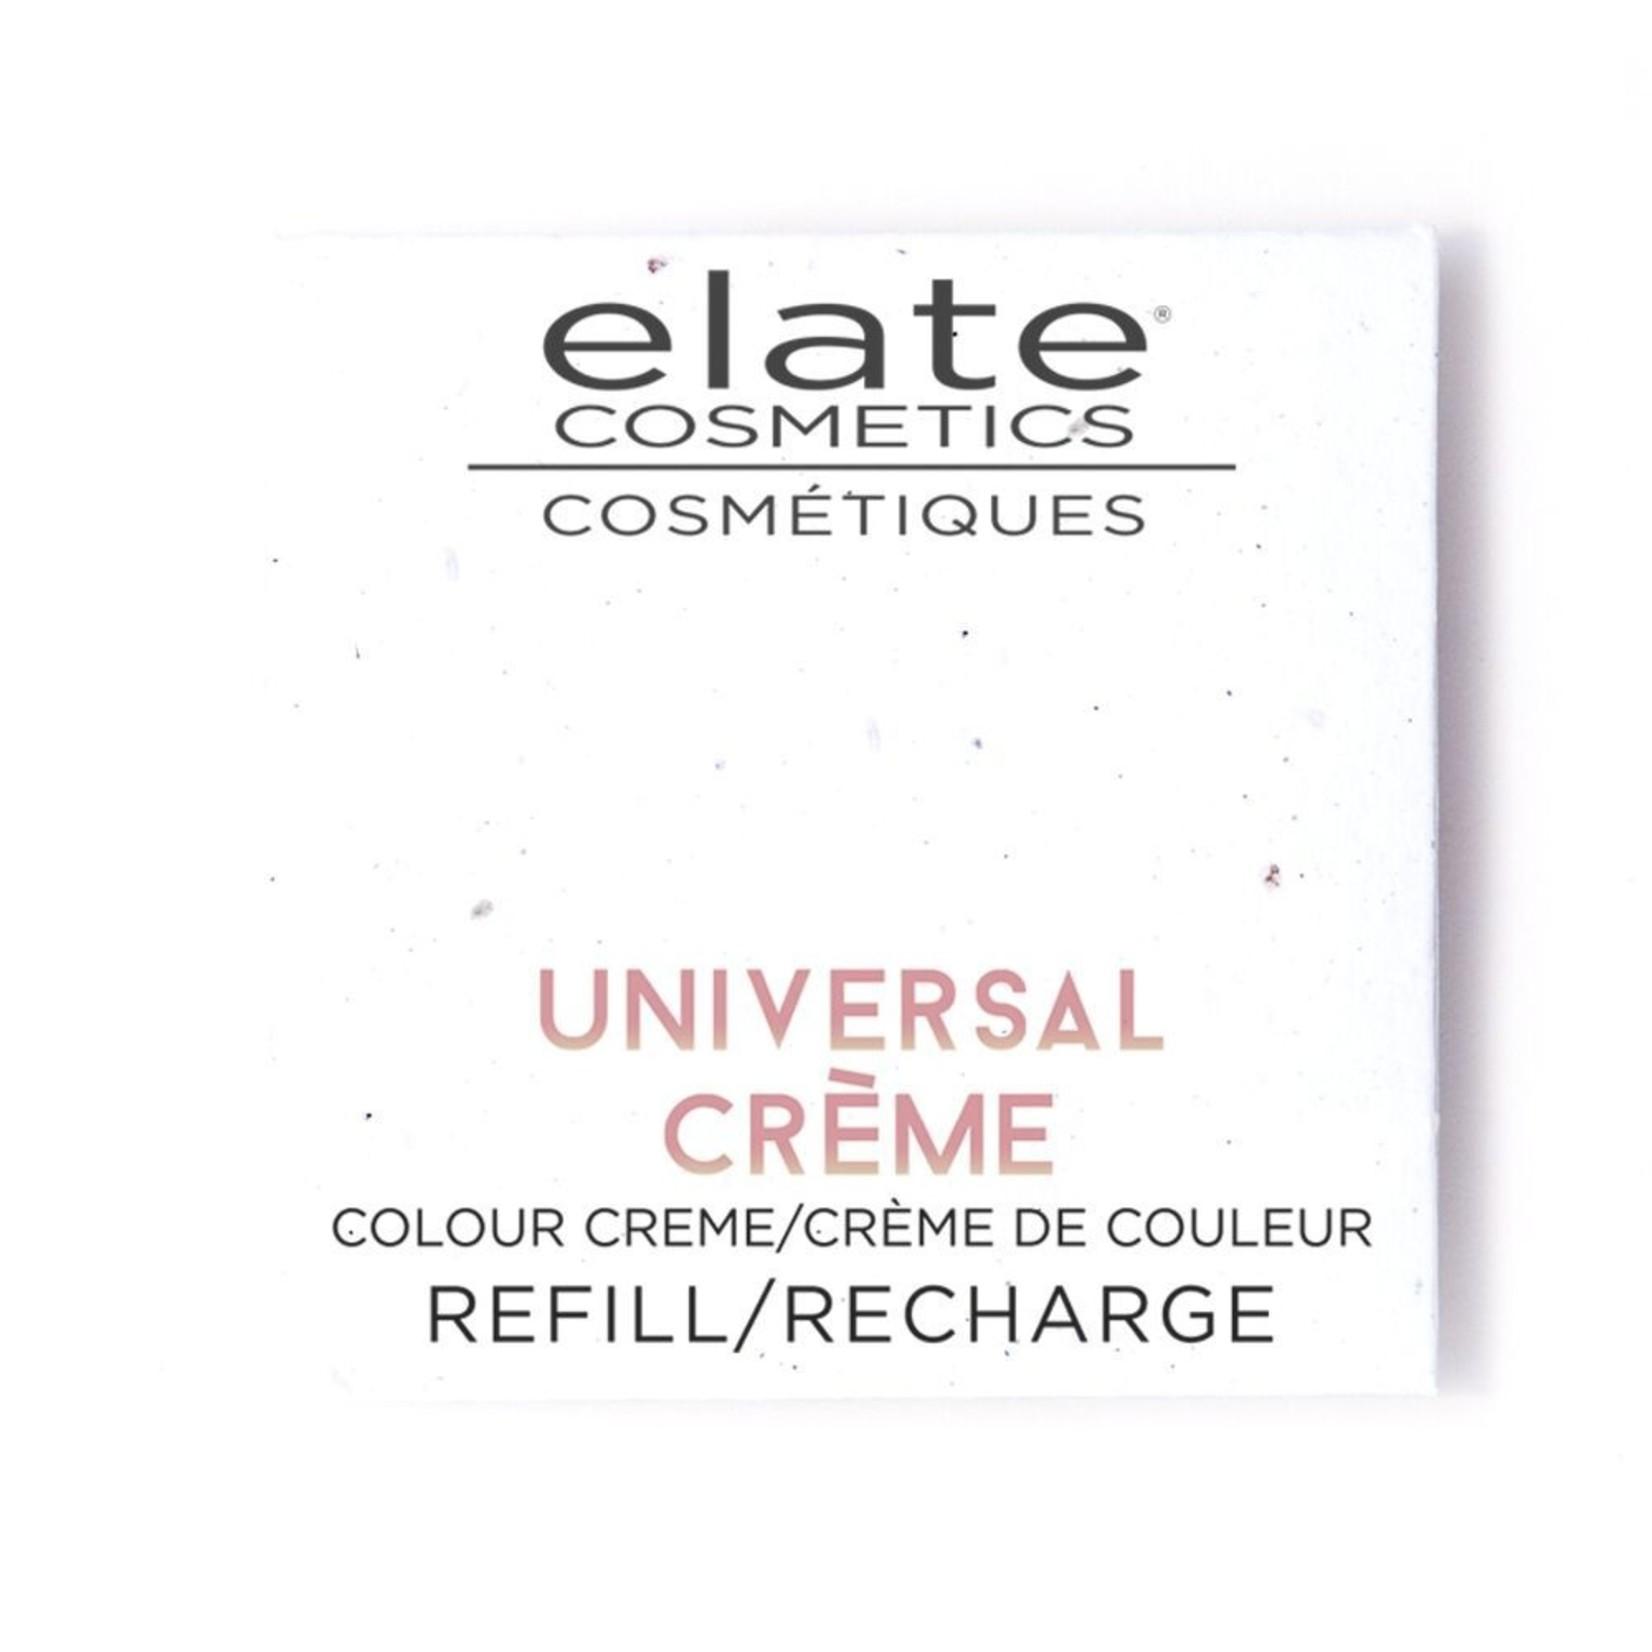 ELATE COSMETICS UNIVERSAL CREME - GILD